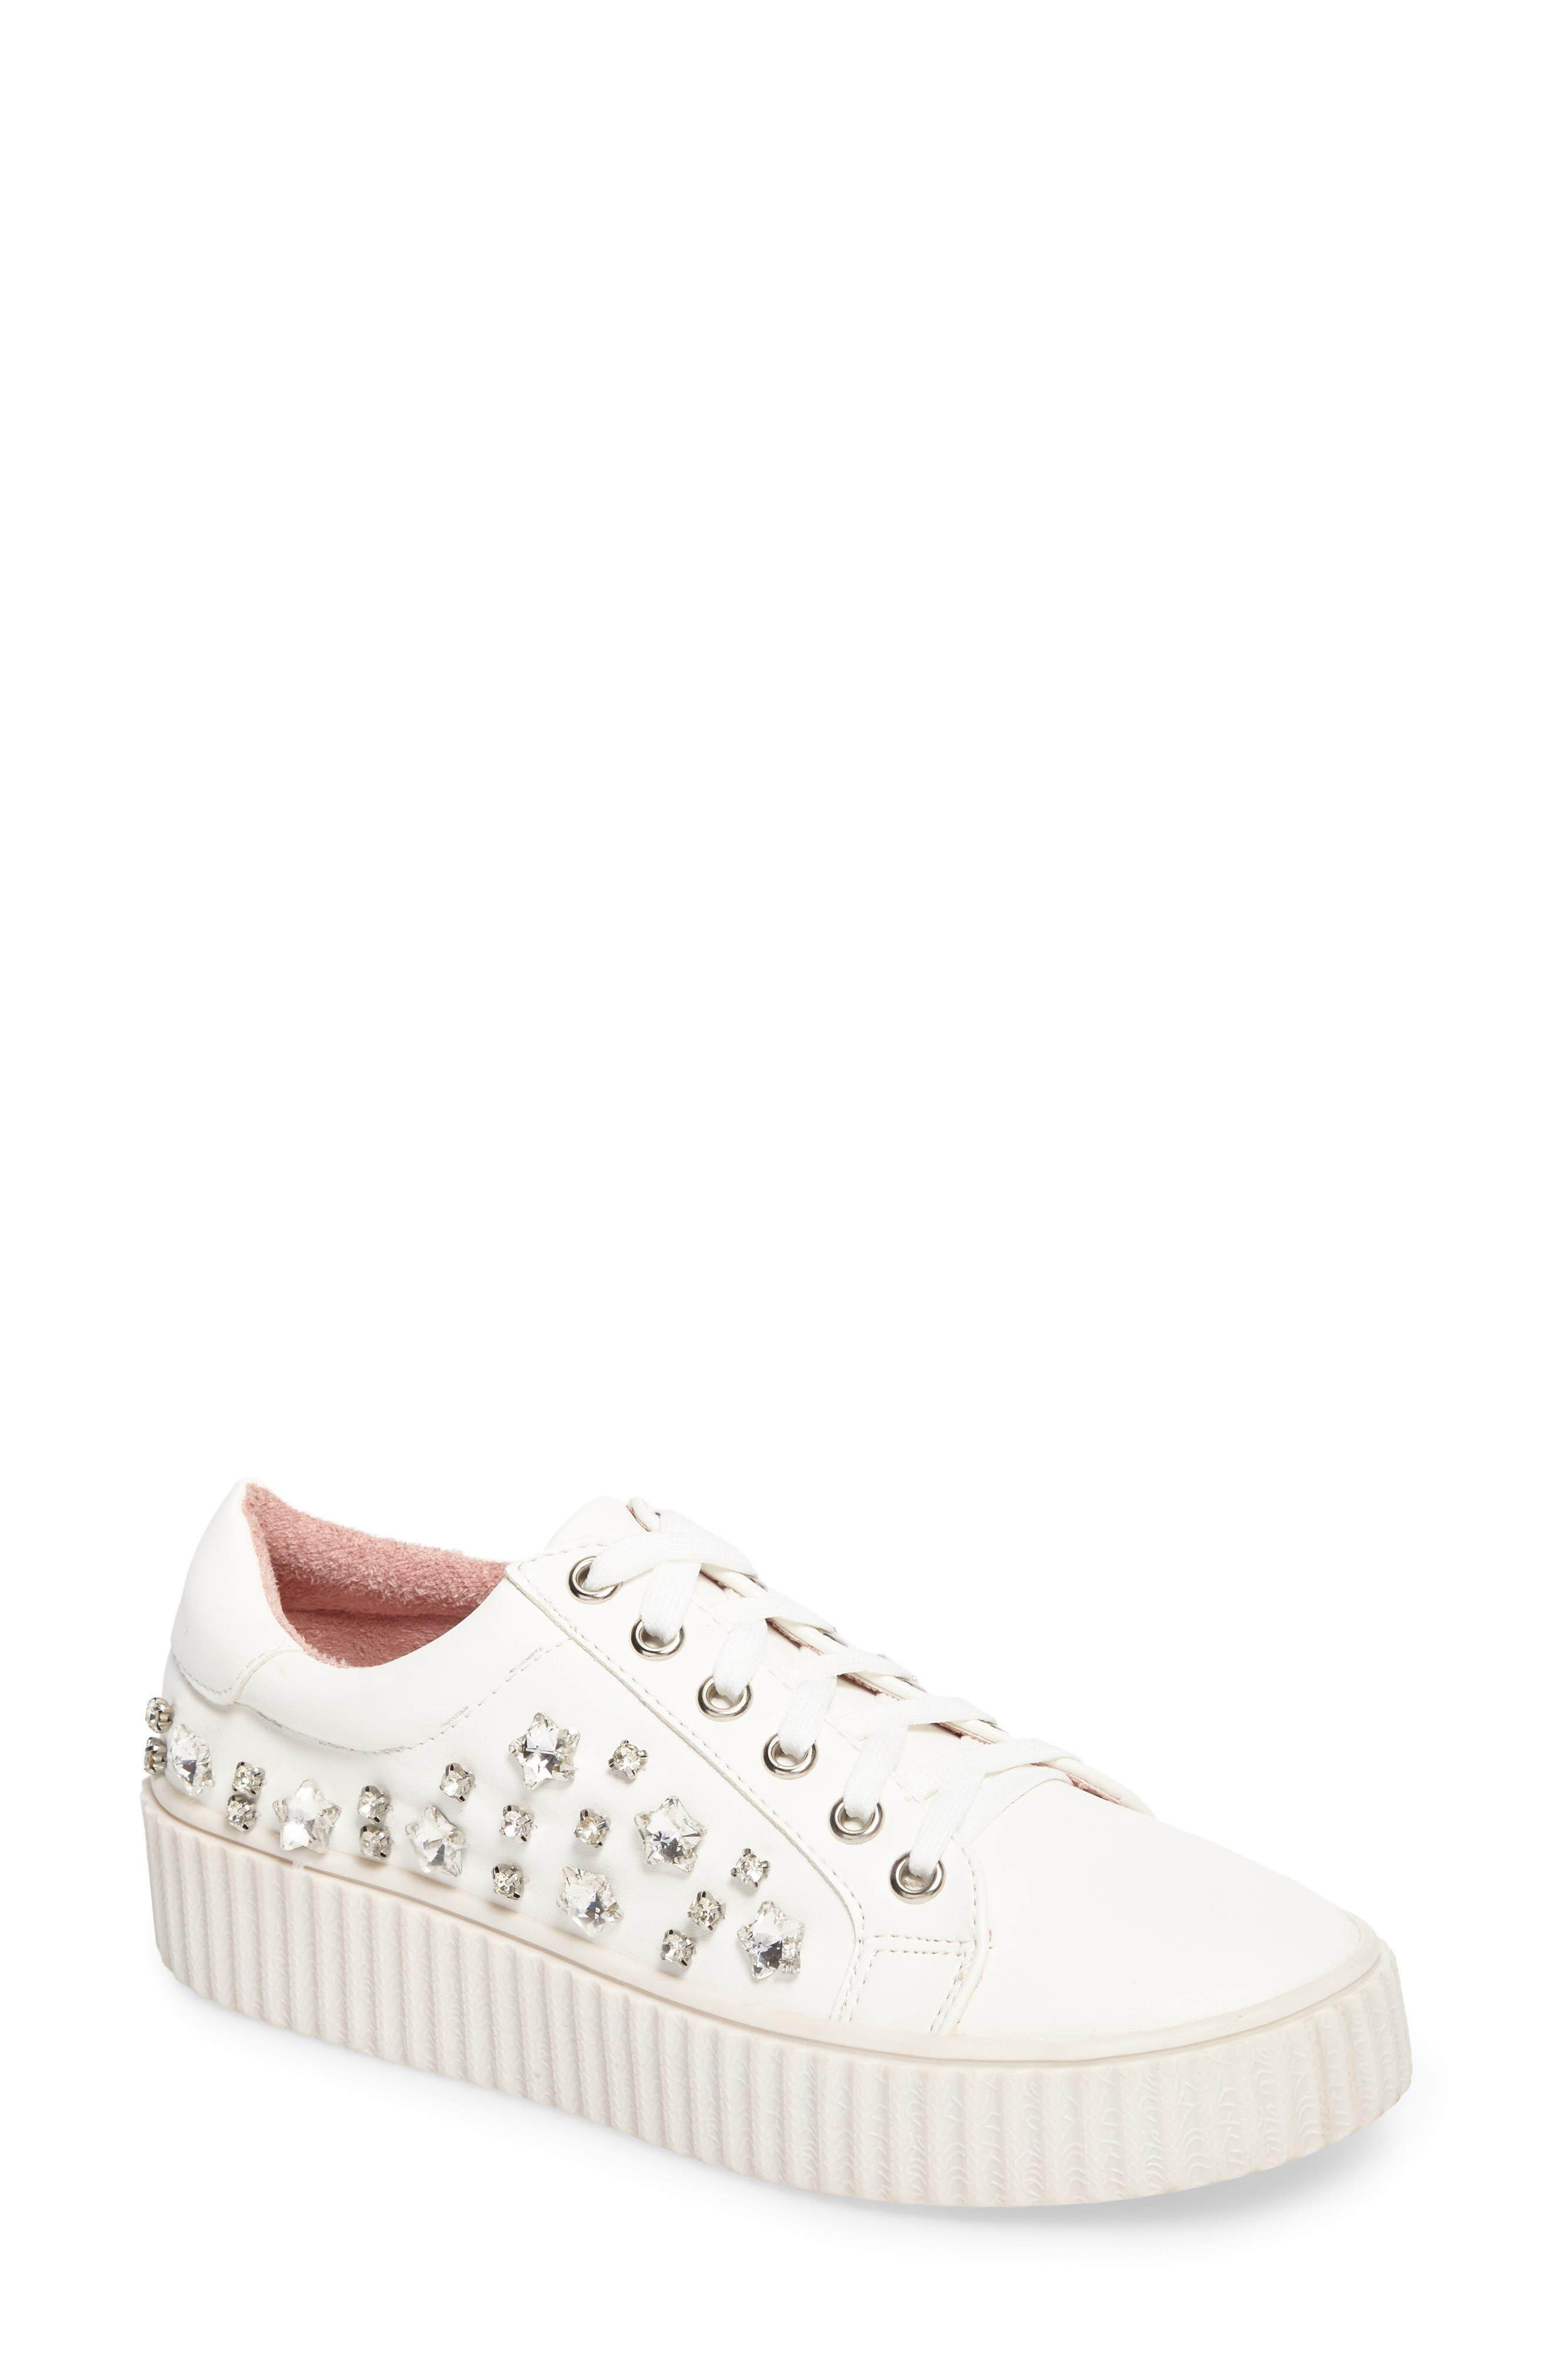 Pam Embellished Platform Sneaker,                             Main thumbnail 1, color,                             White